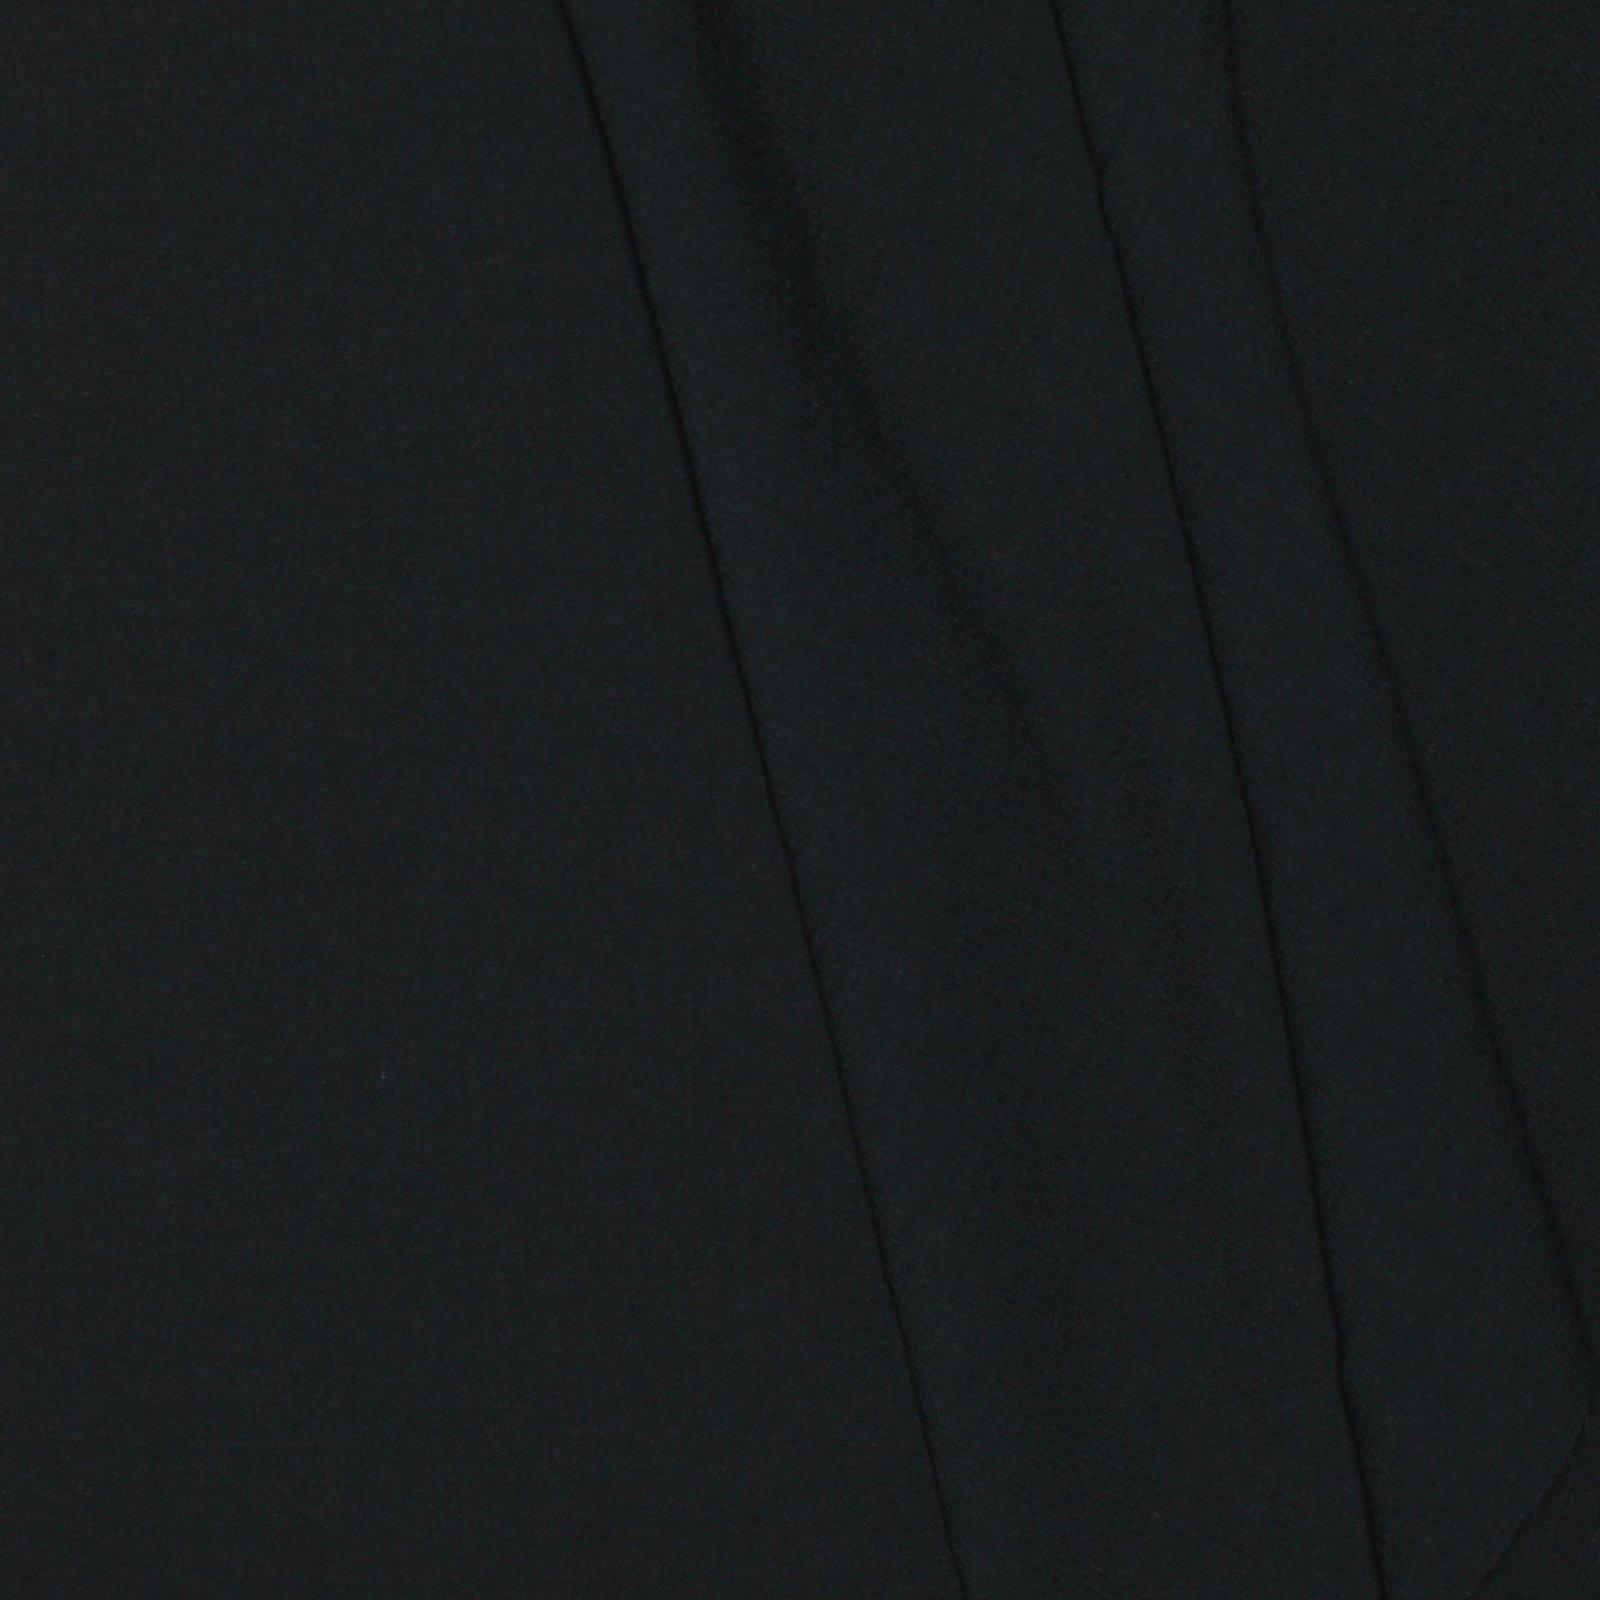 Solid Charcoal Grey Italian Wool/Lyrca Textured Crepe